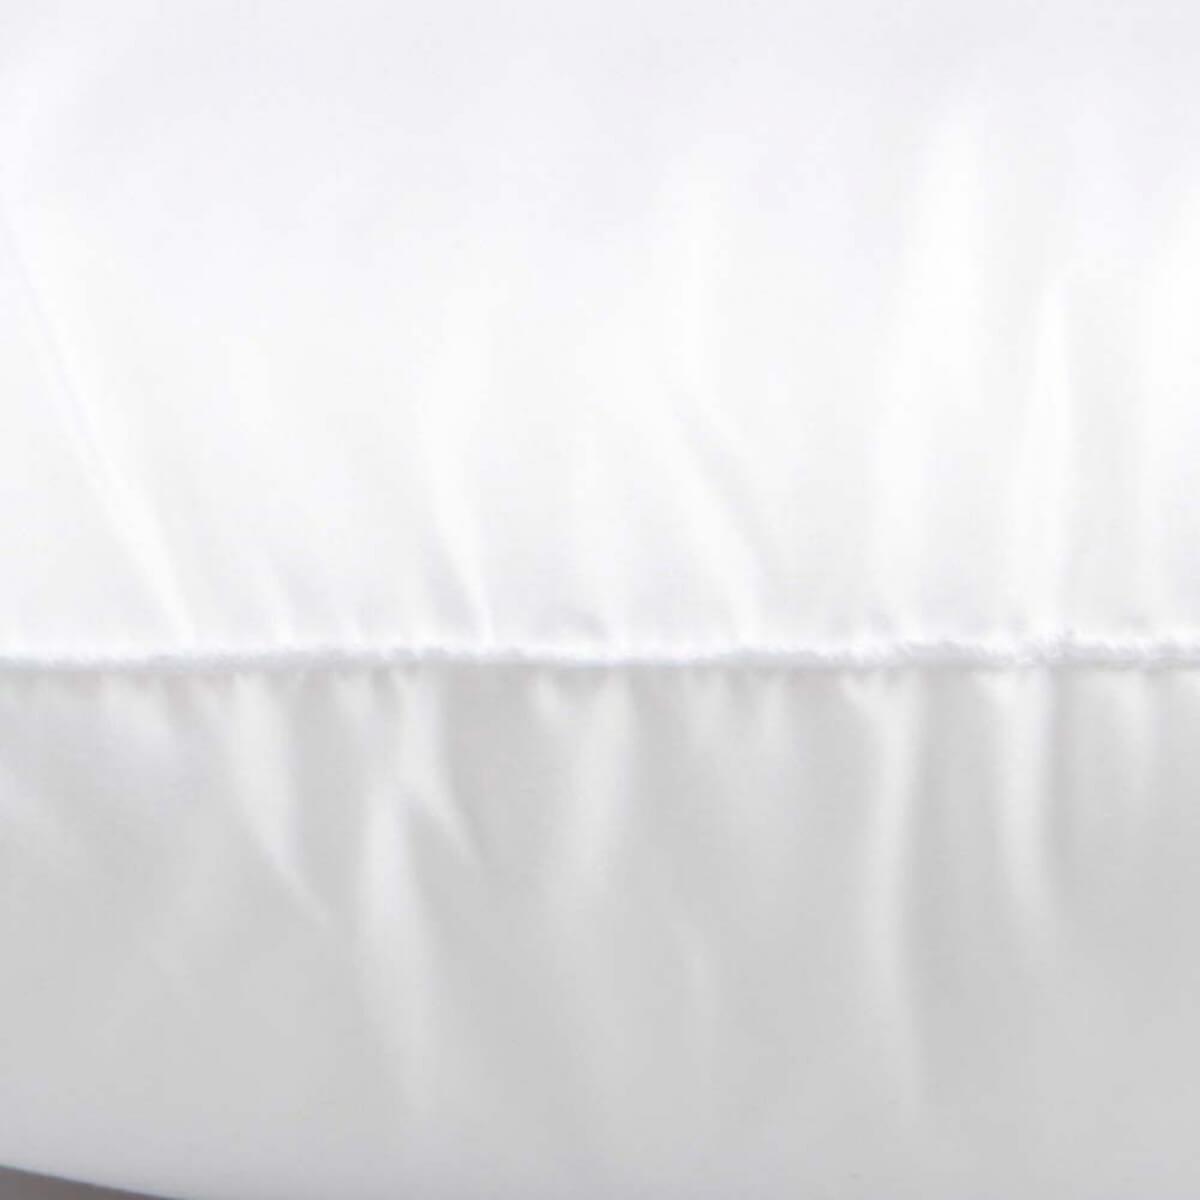 coussin de garnissage carr 50cm x 50cm fabrication fran aise mercerie car fil. Black Bedroom Furniture Sets. Home Design Ideas